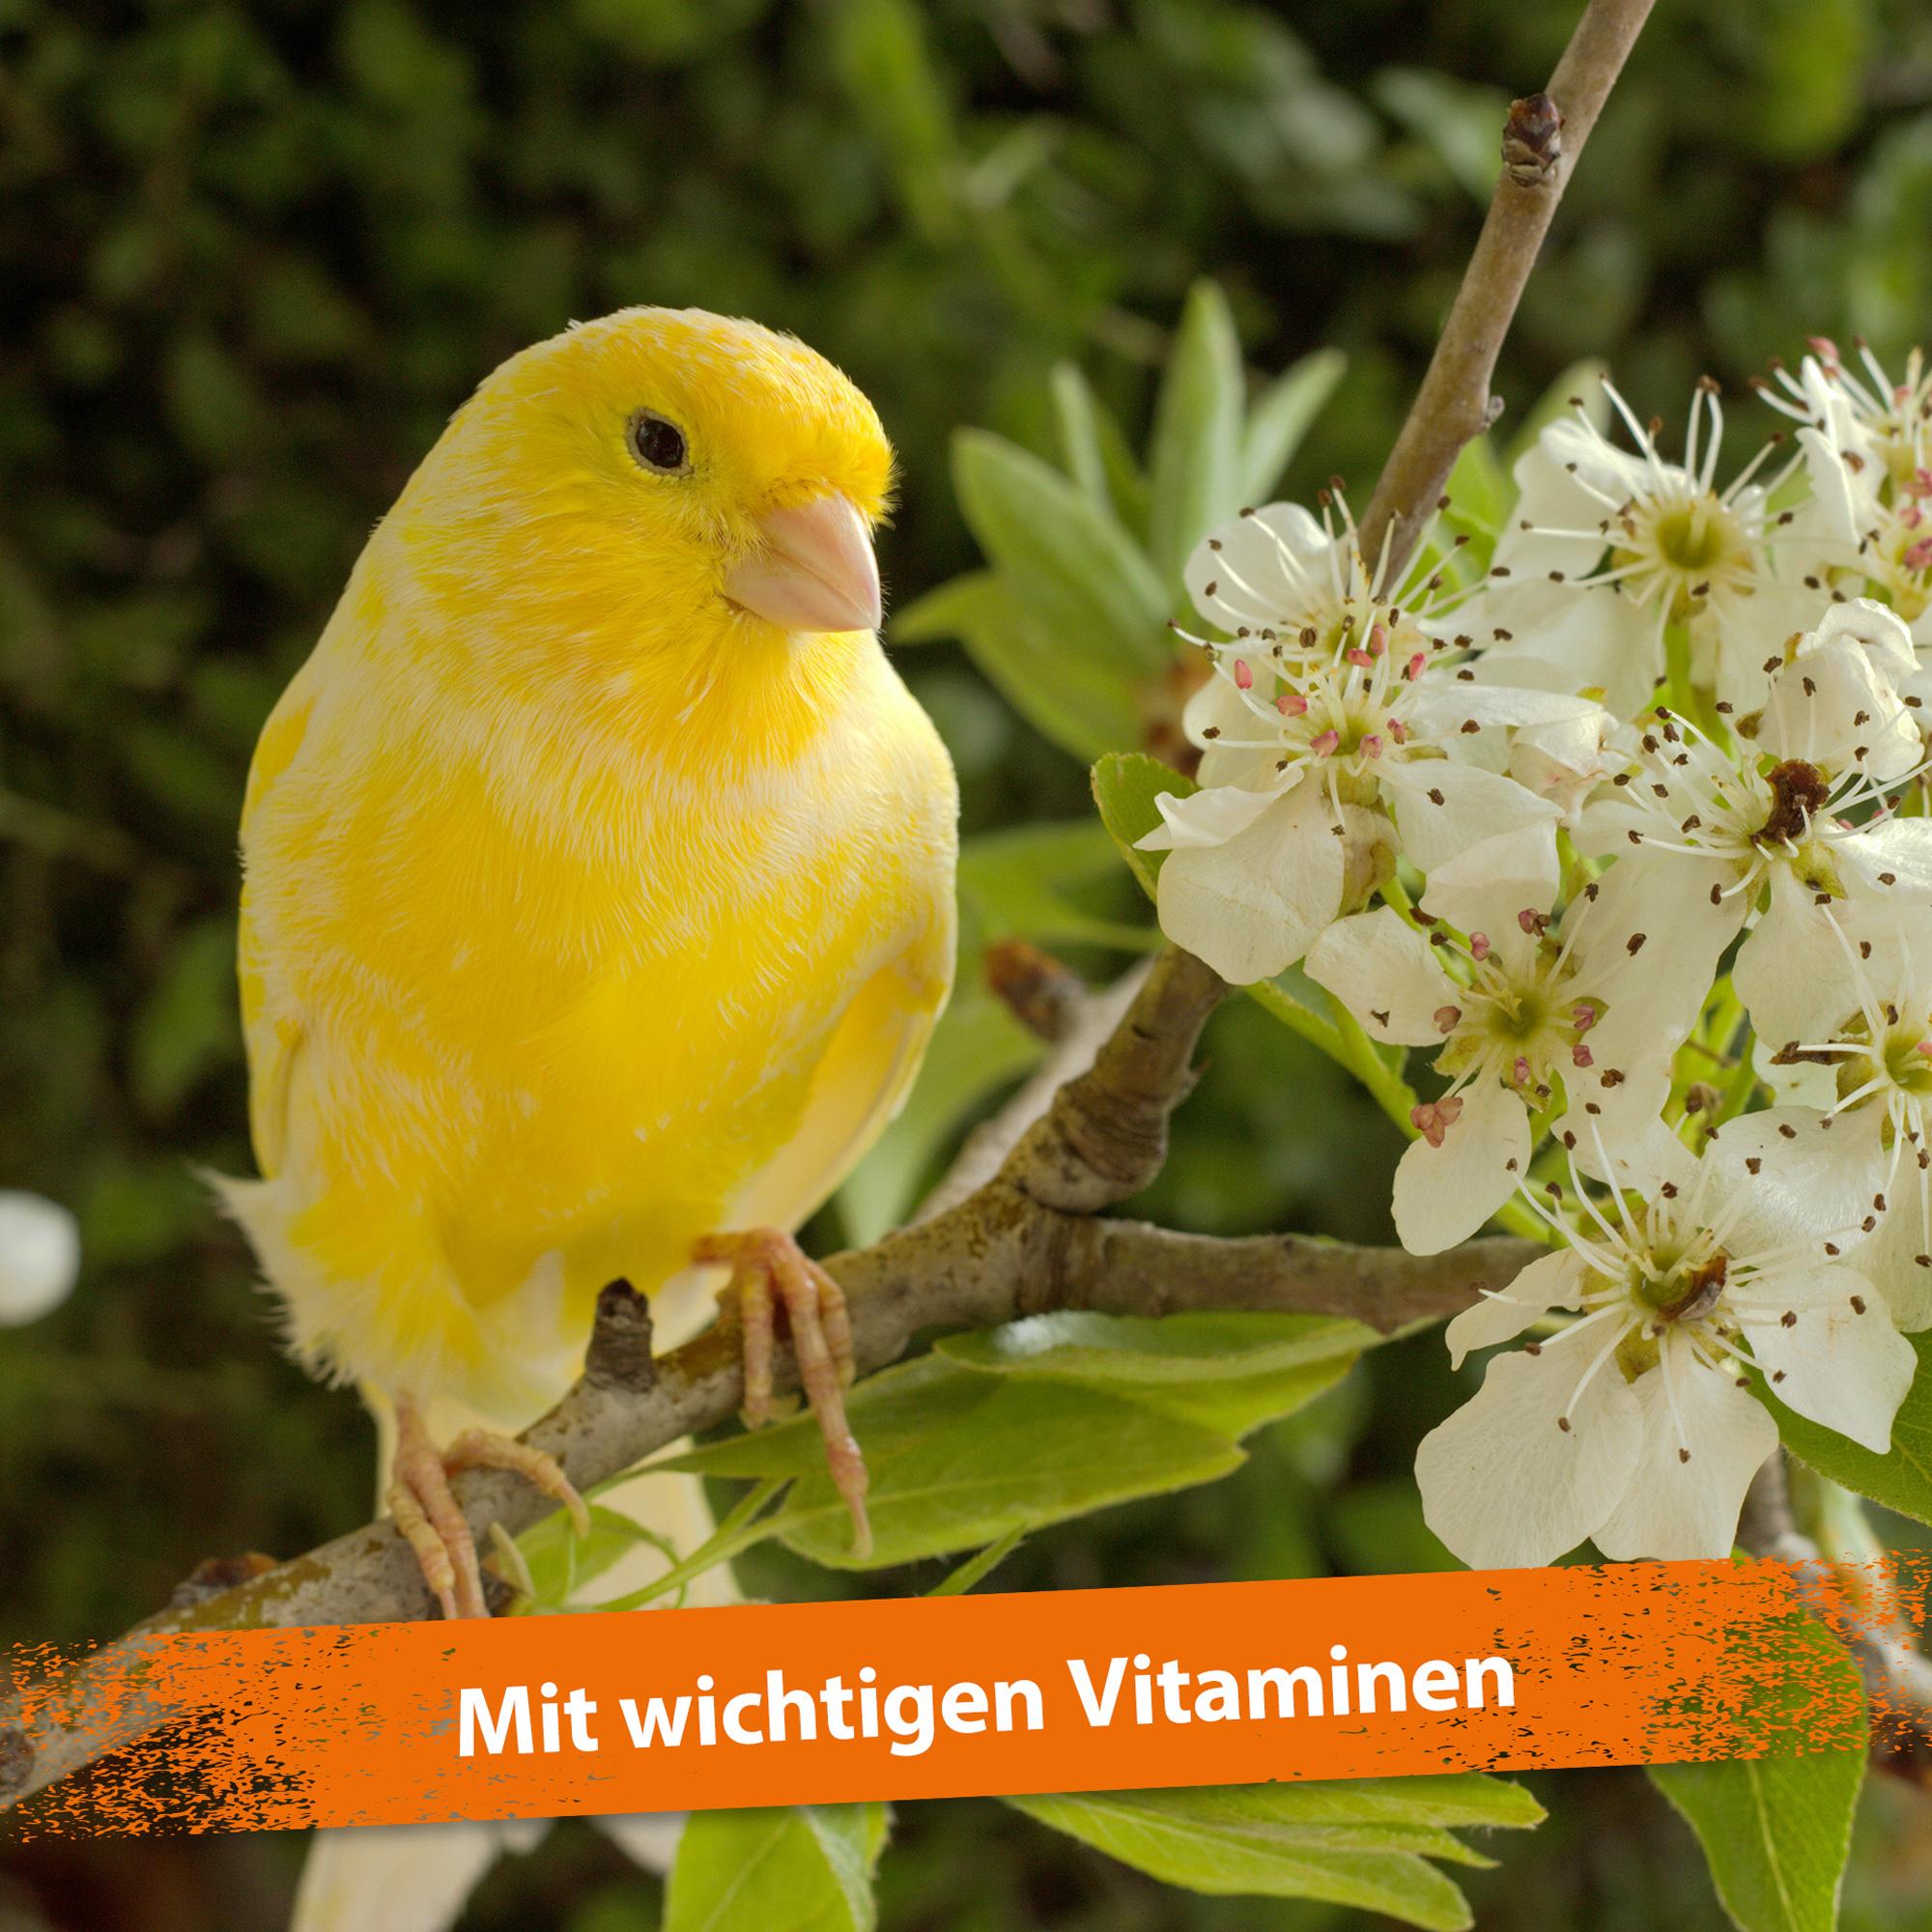 Mispusan - Mineralfuttermittel für Amphibien, Reptilien & Vögel - 200 g